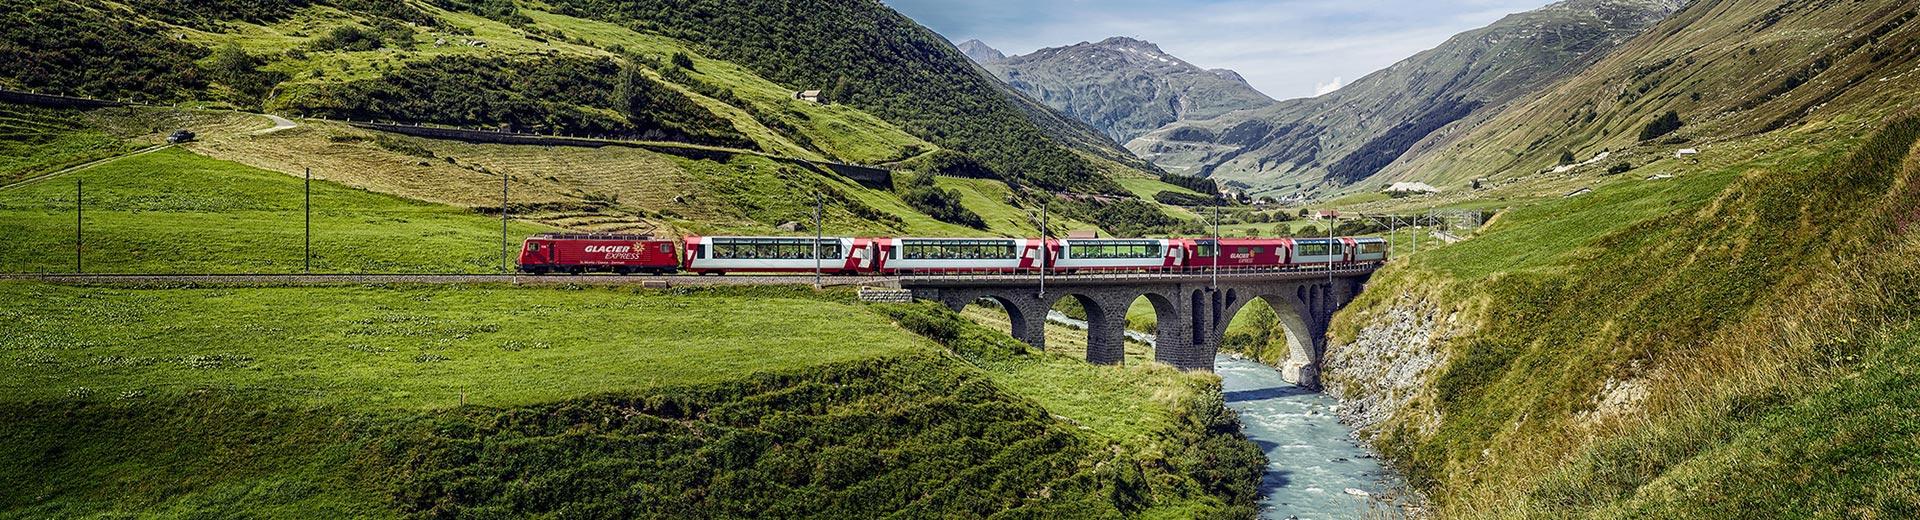 Gruppenreise Glacier Express